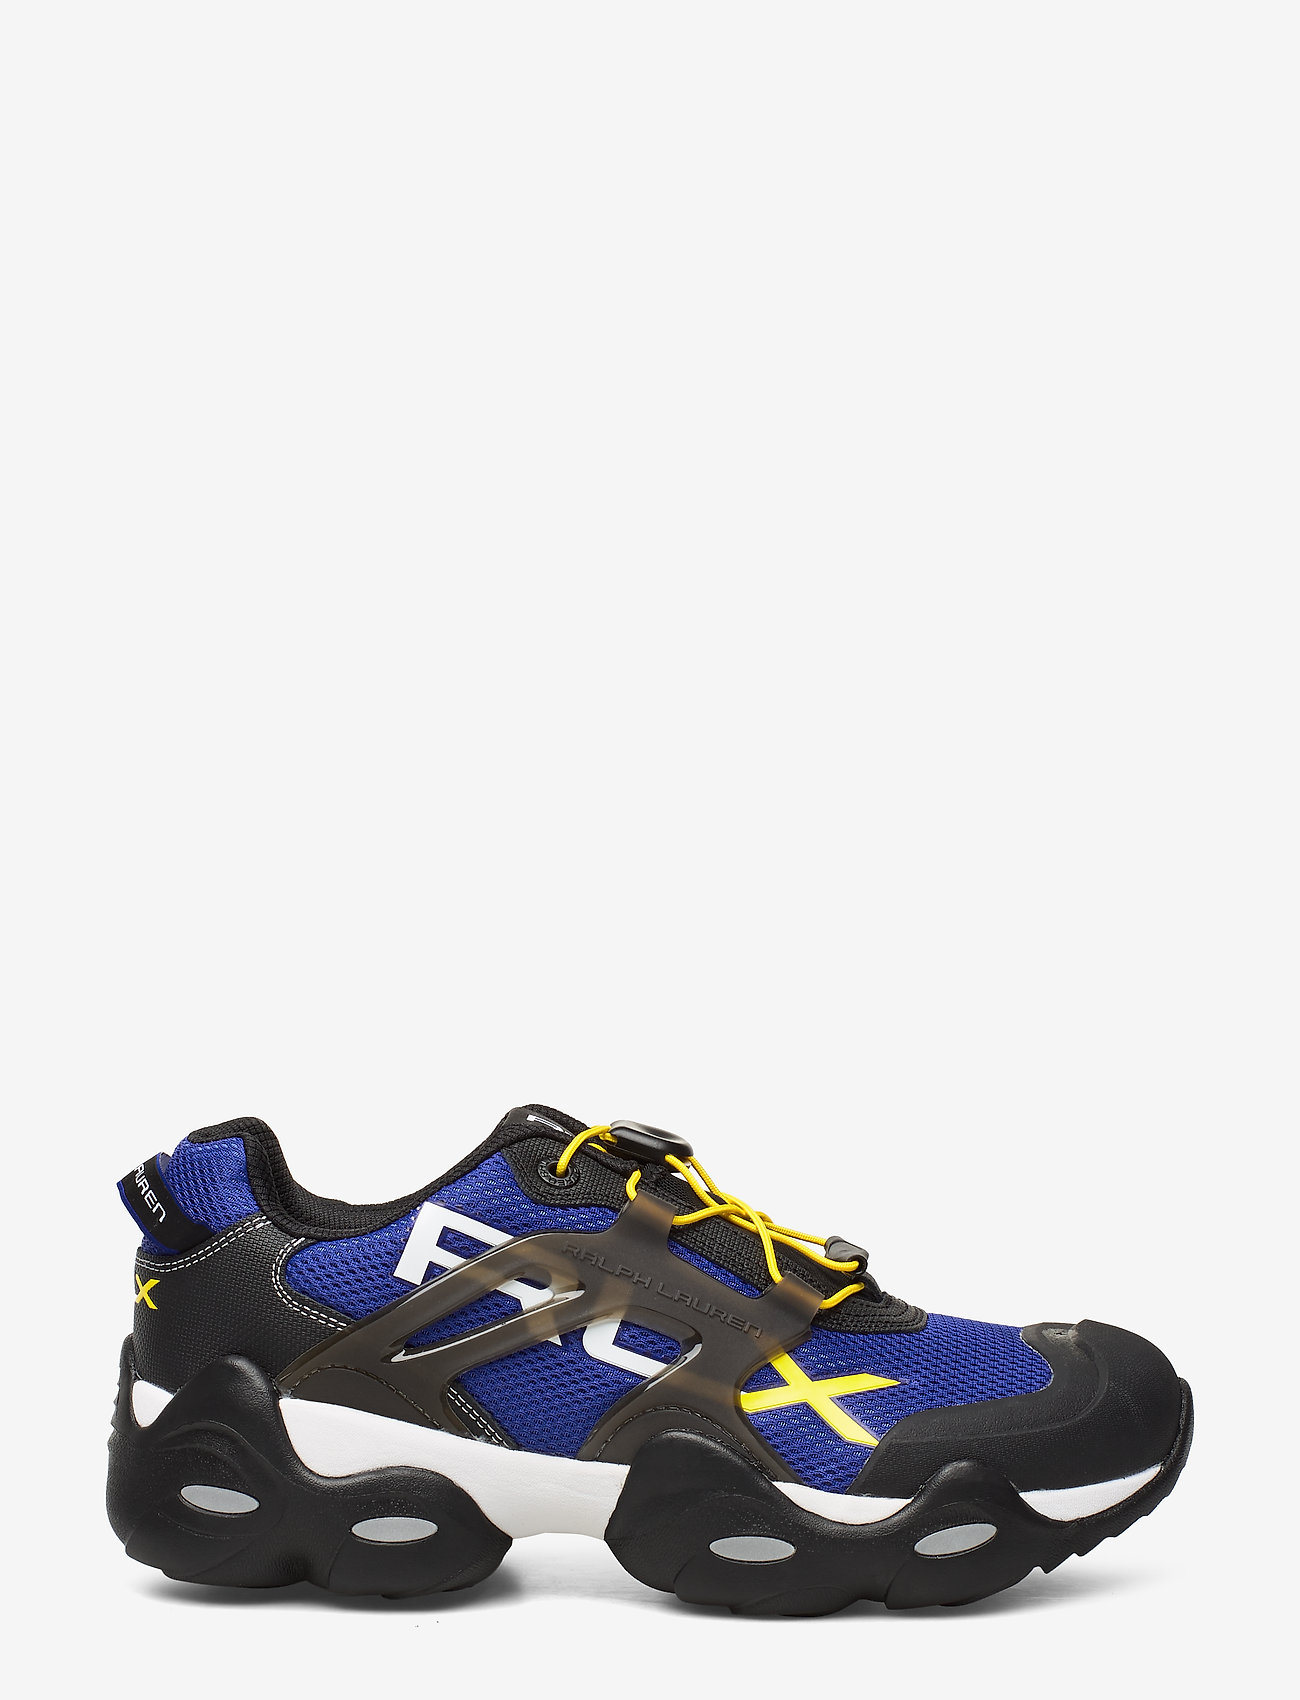 Rlx Tech-sneakers-athletic Shoe (Black/royal Blue) - Polo Ralph Lauren zv2ZPp